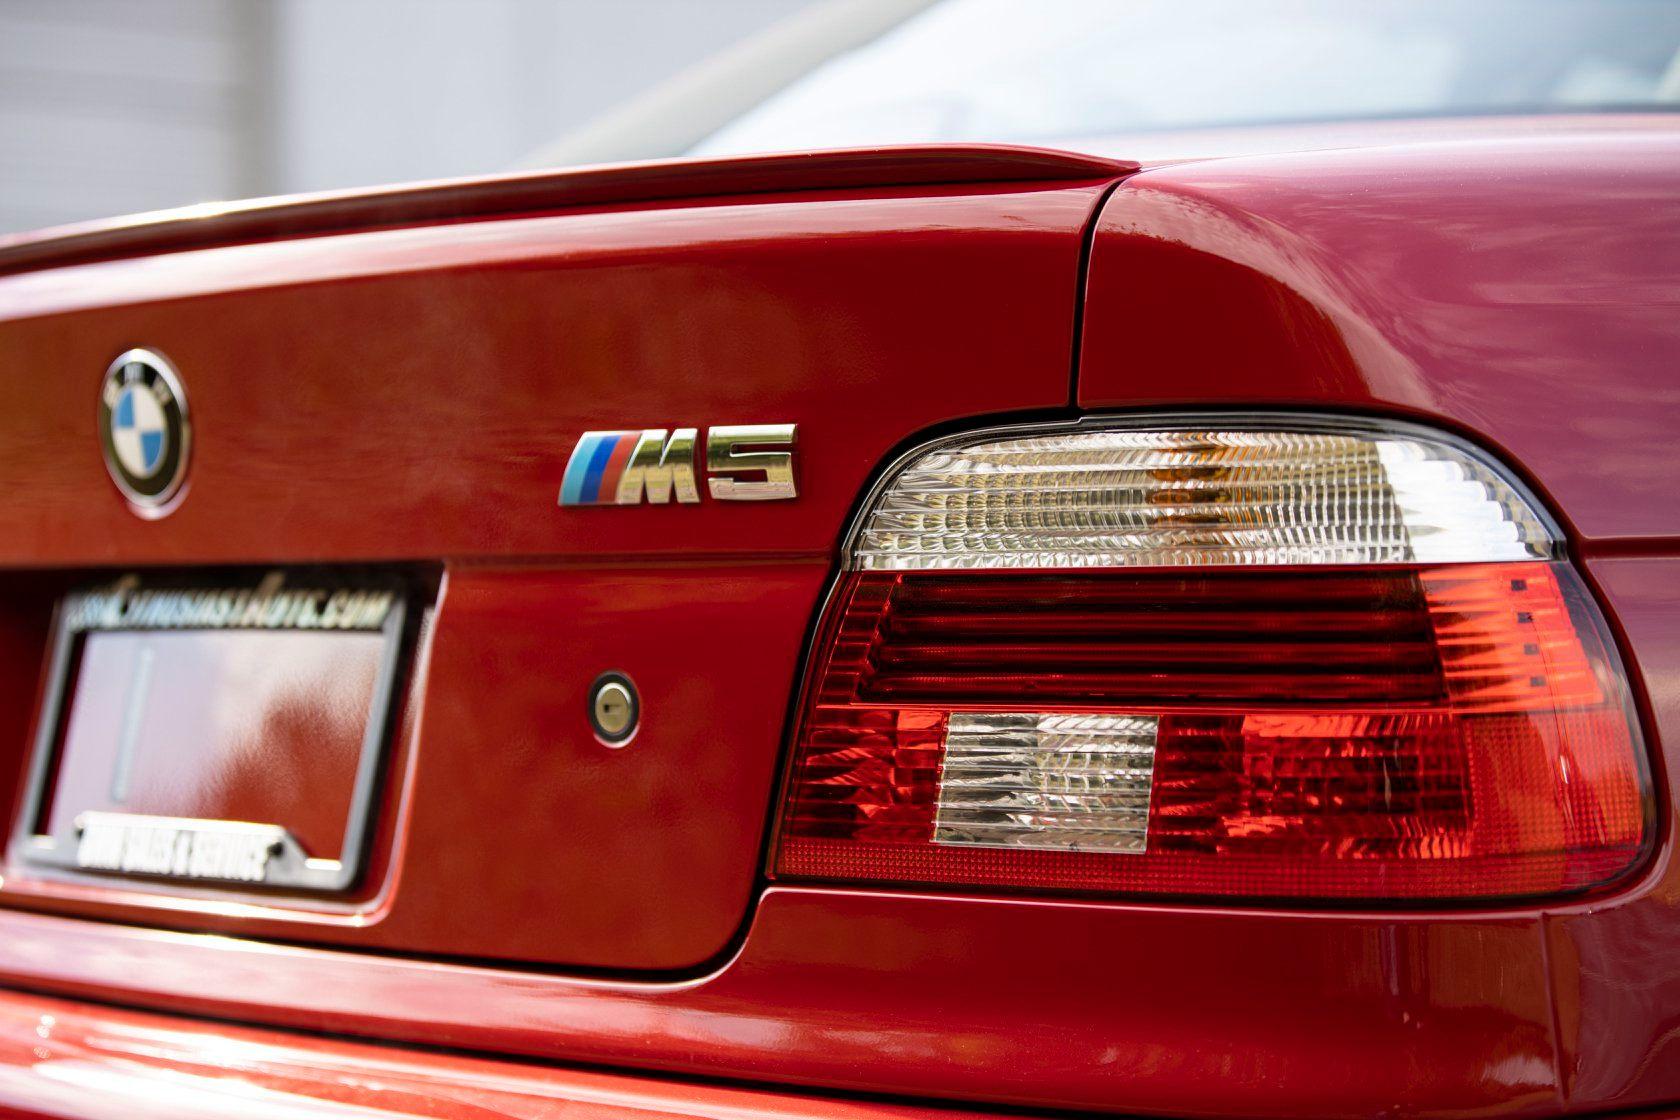 BMW_M5_E39_Imola_Red_0003